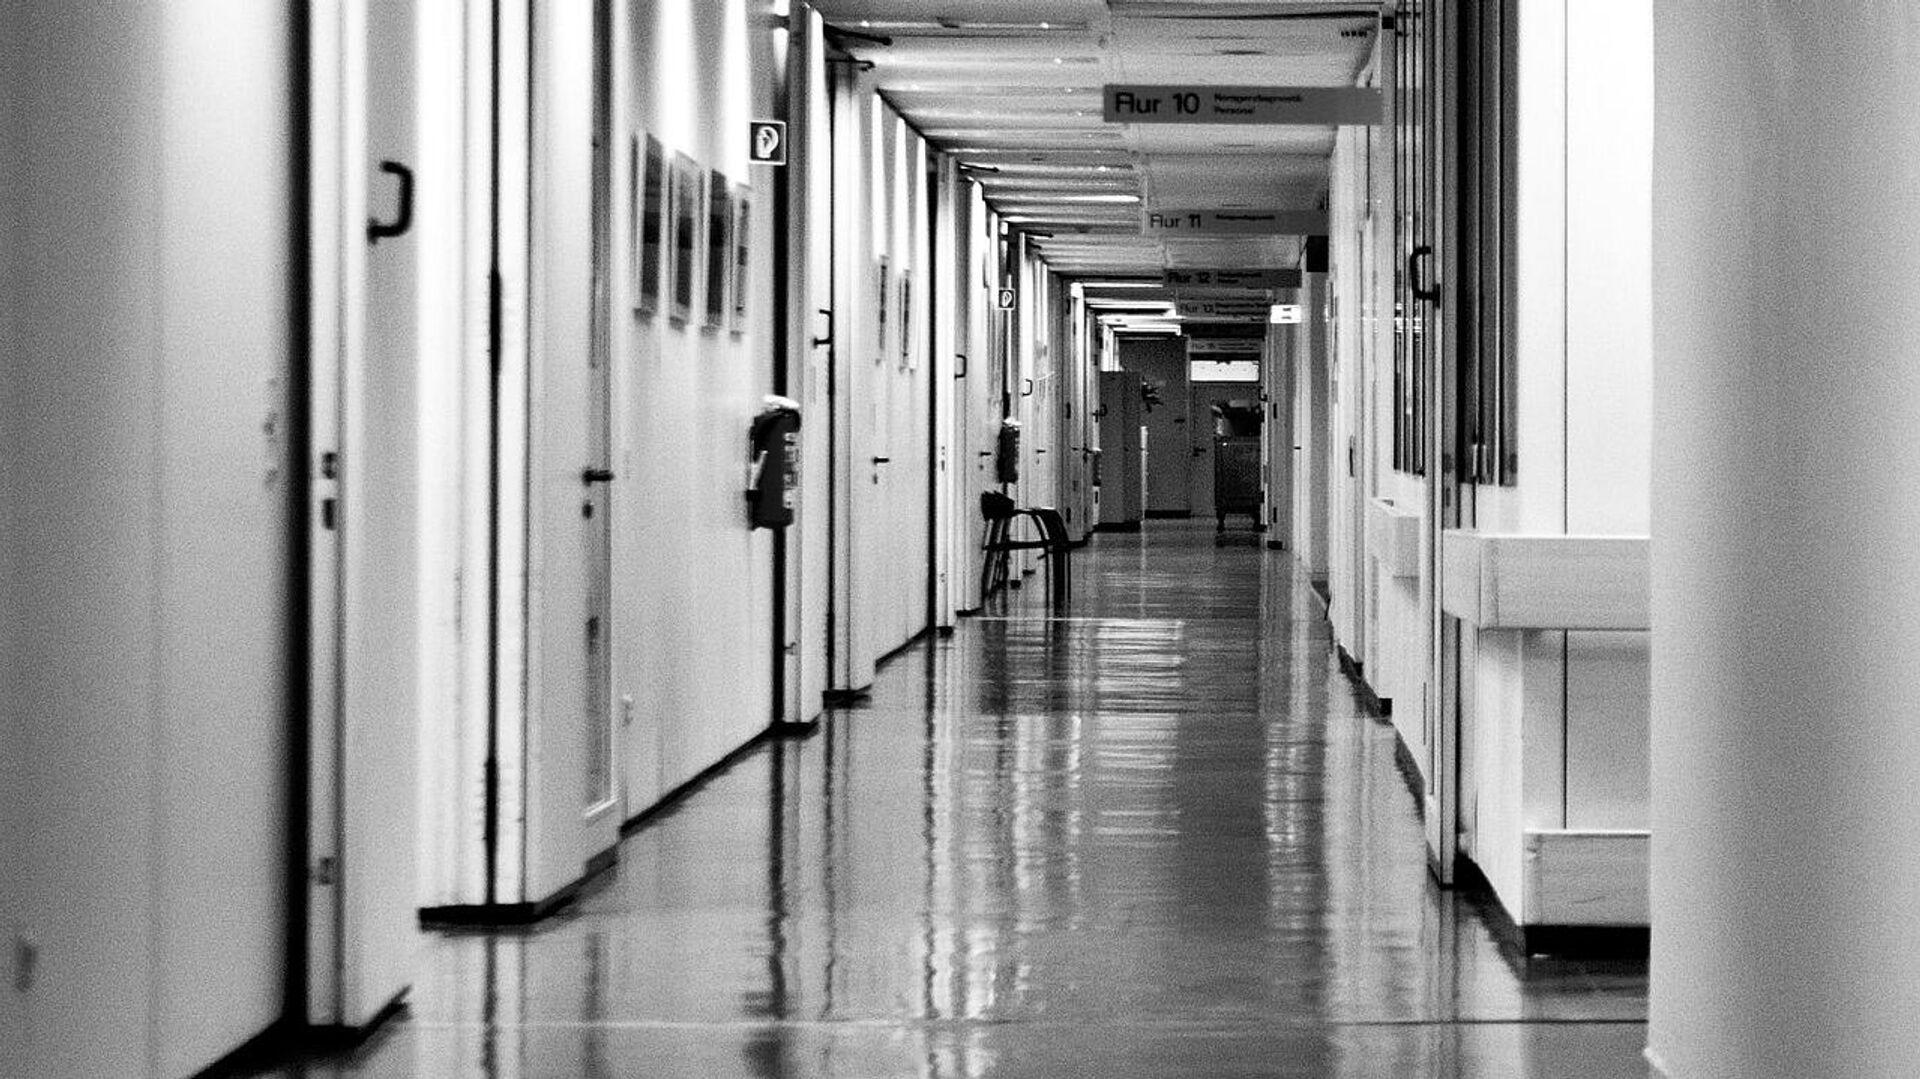 Hospital (imagen referencial) - Sputnik Mundo, 1920, 18.09.2021